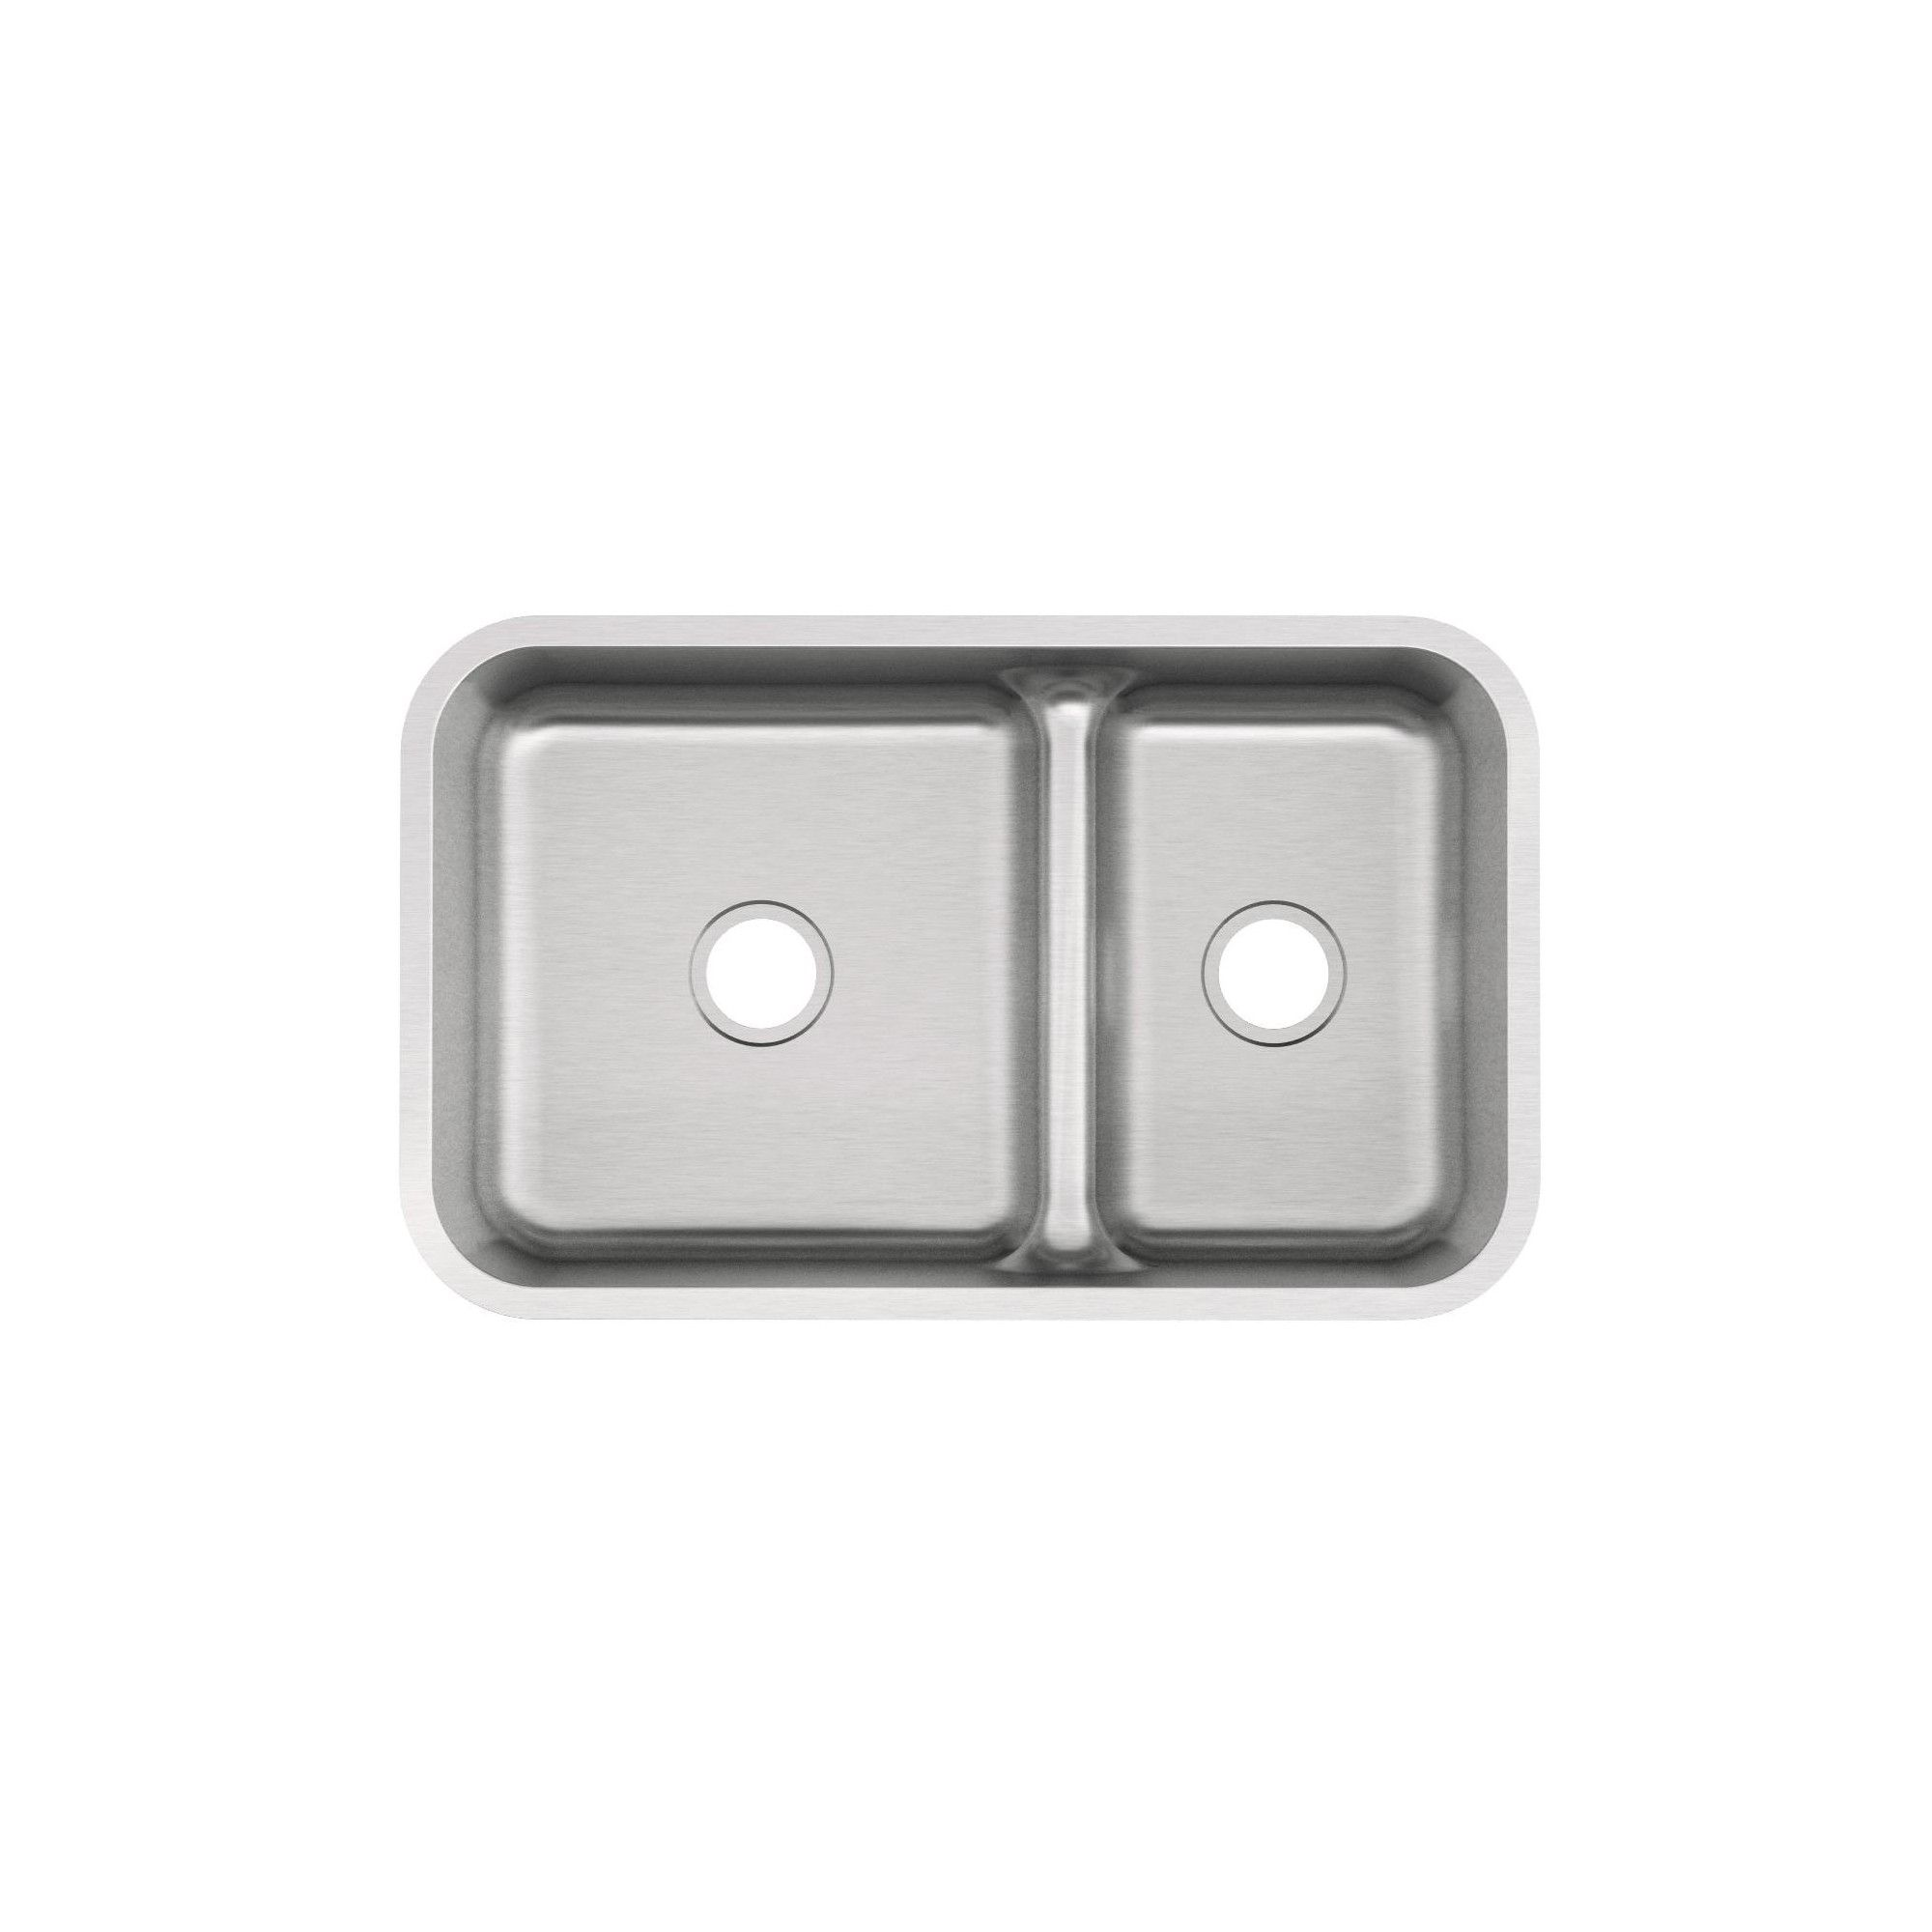 Mirabelle Mirurb3421 34 Double Basin Stainless Steel Kitchen Sink